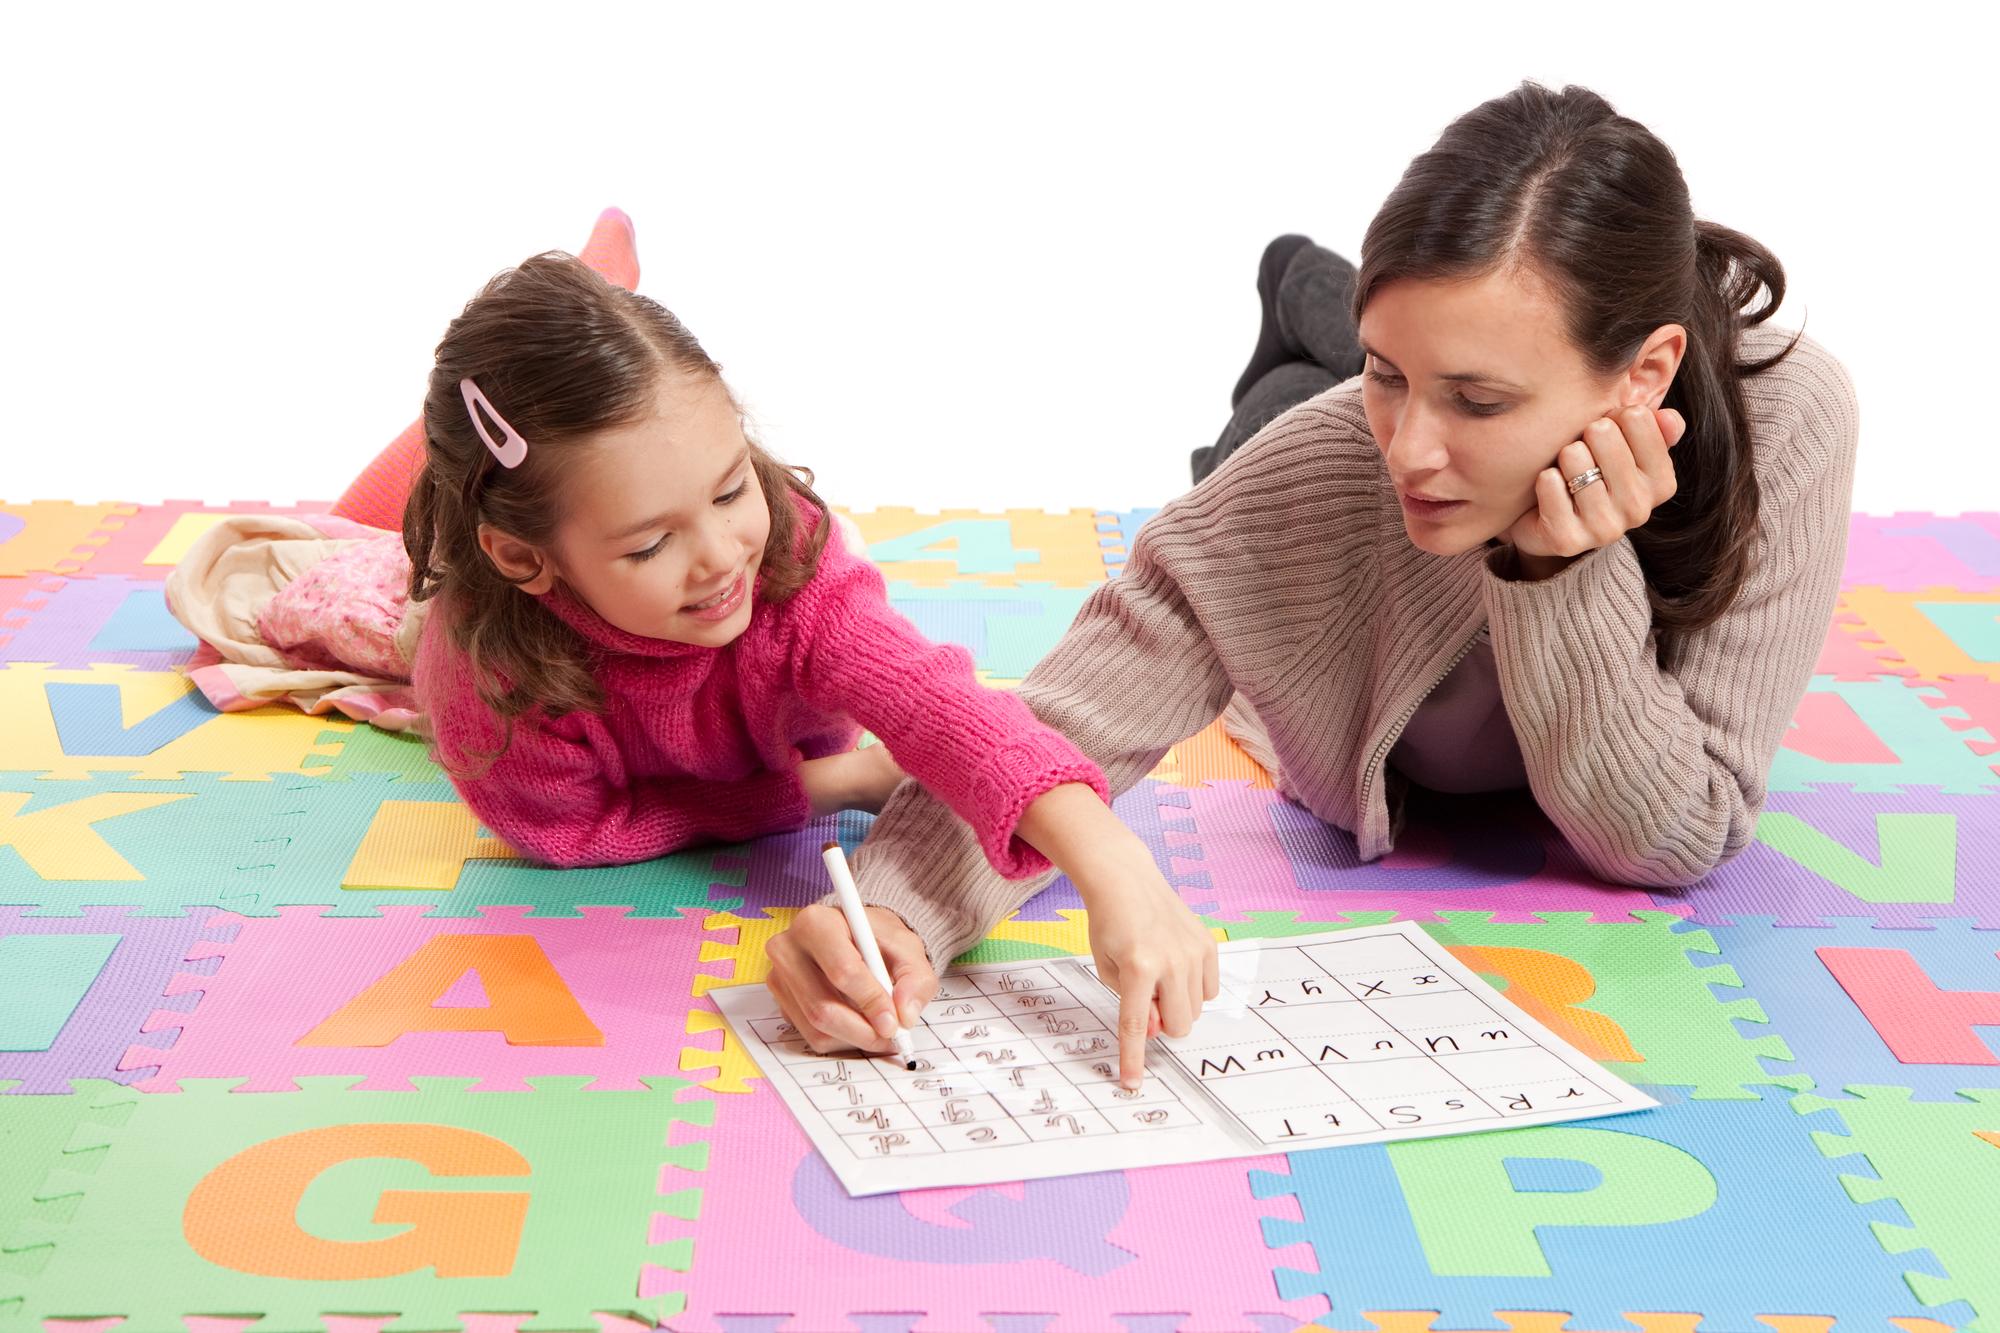 Modern Homeschool Family Homeschool Resources Insights